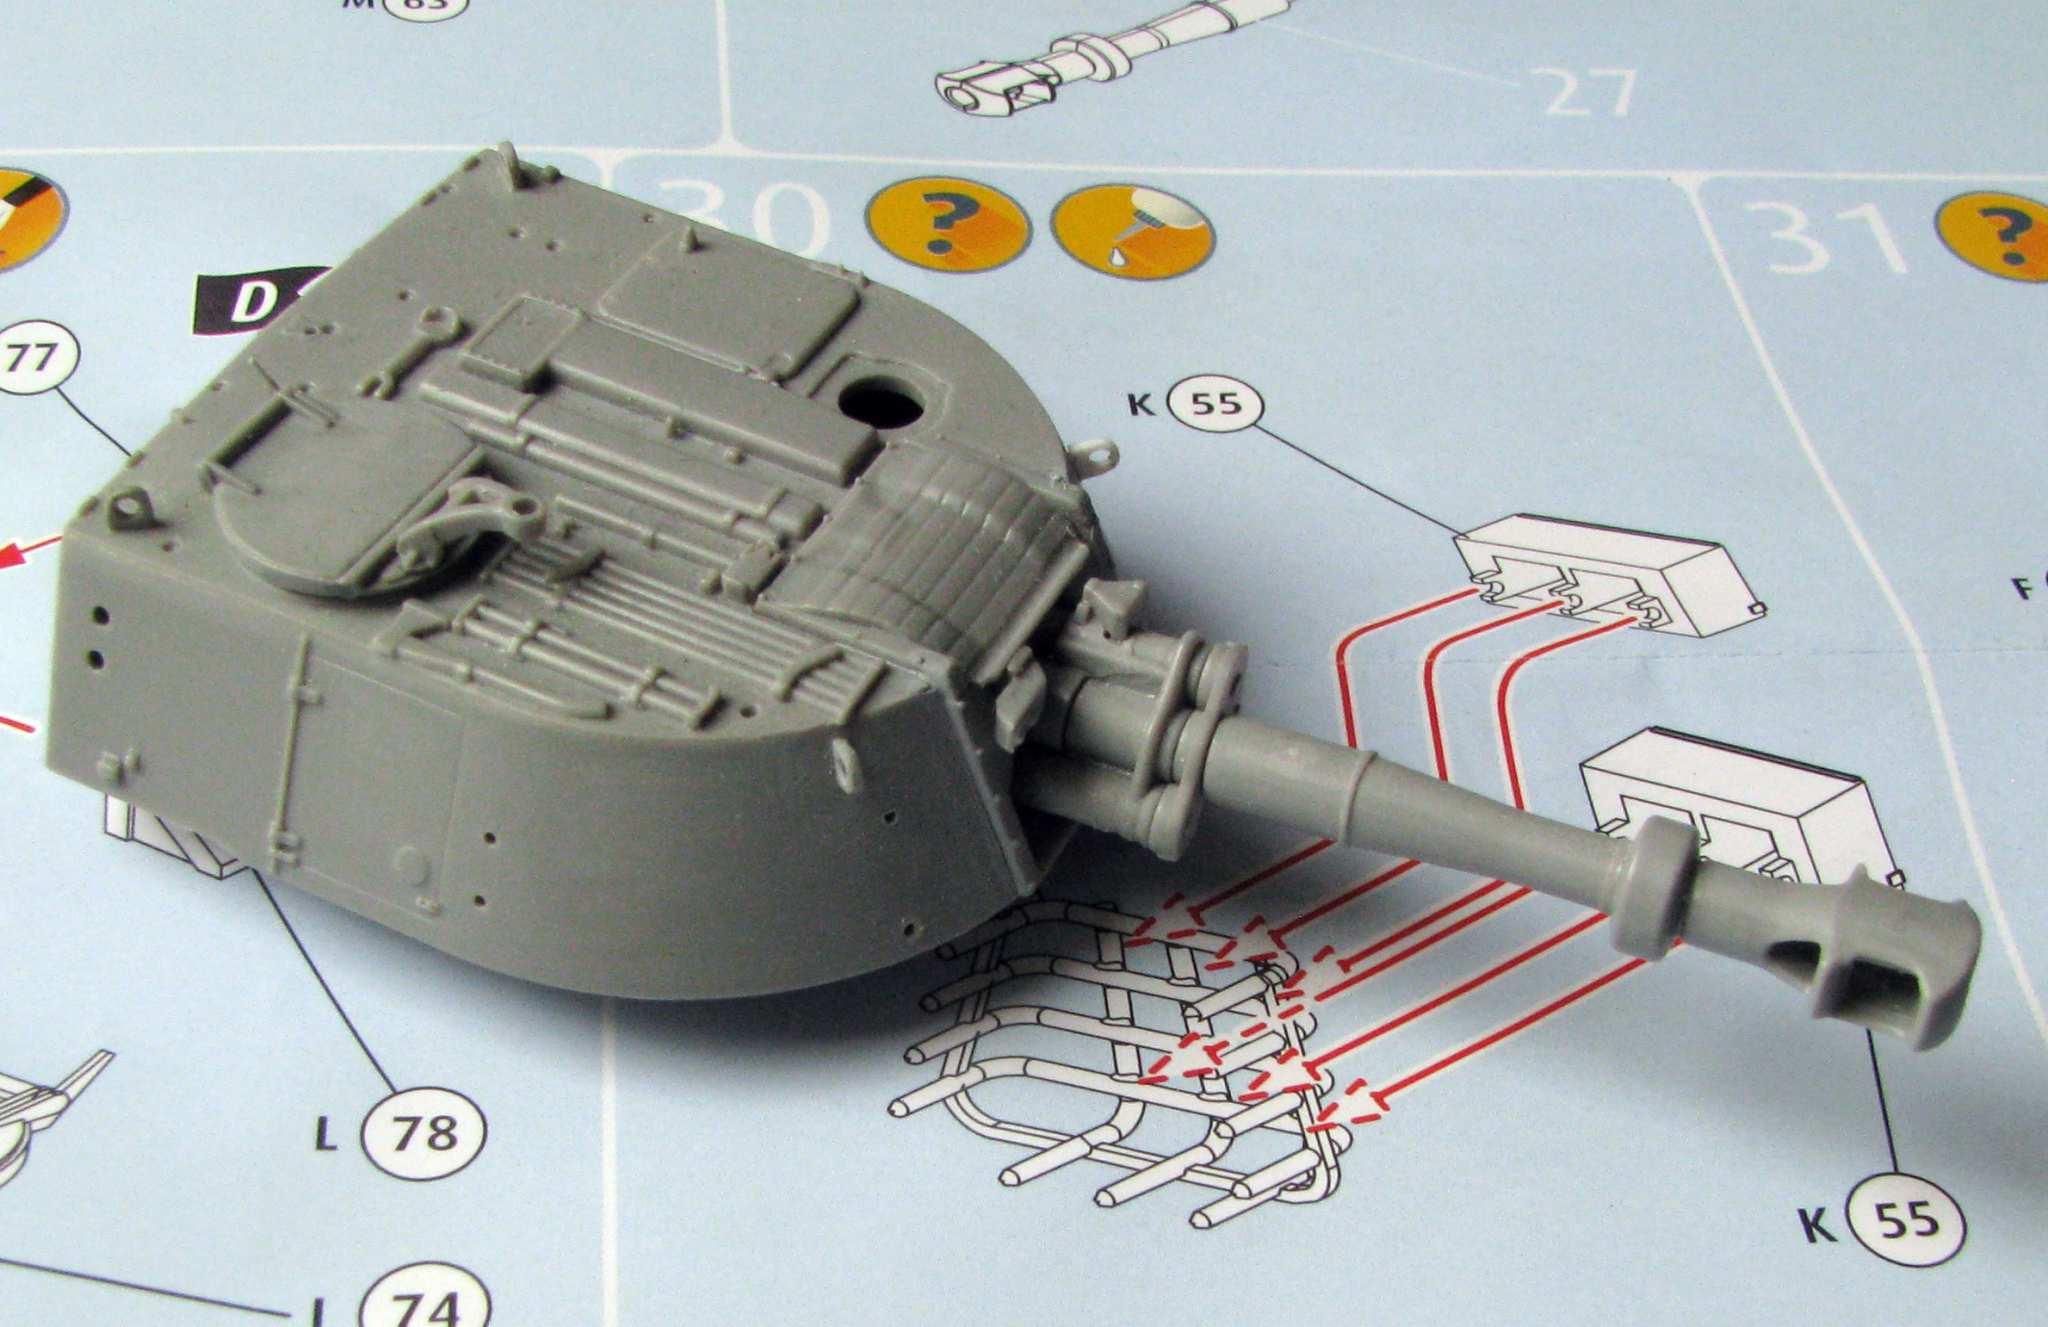 turret02.jpg